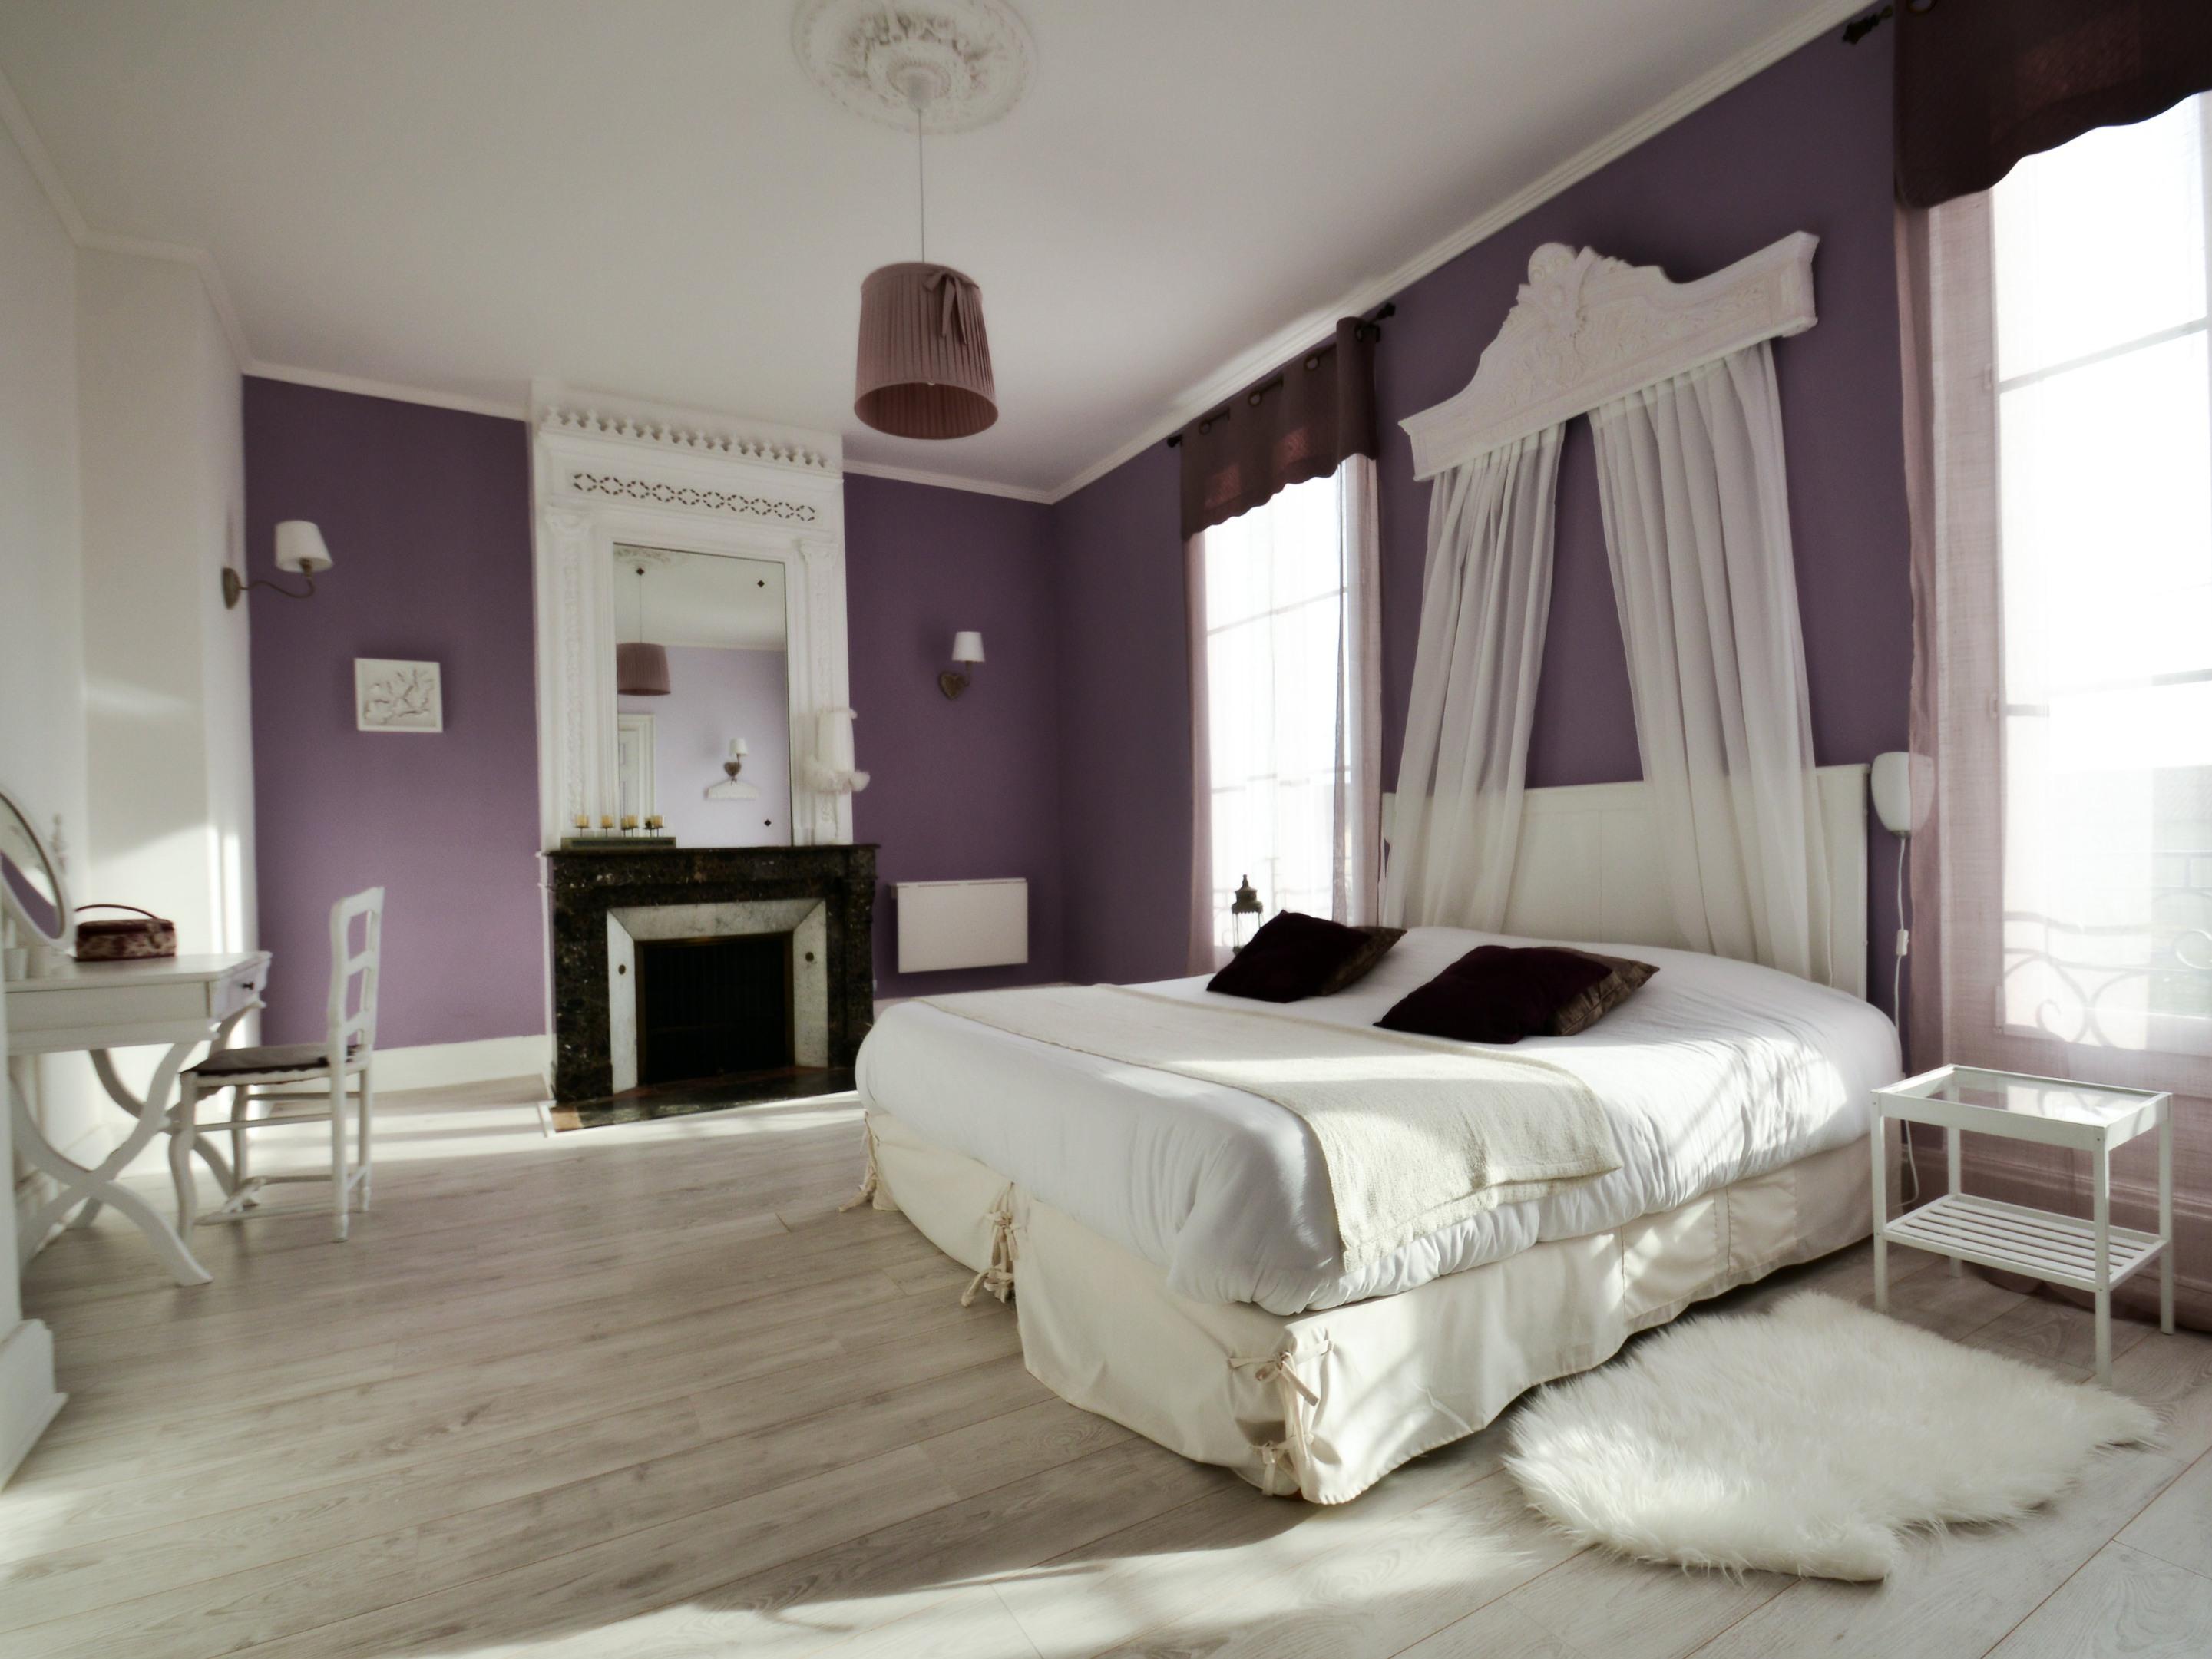 Chambre Style Shabby Romantique le petit domaine de colayrac, colayrac saint cirq, france